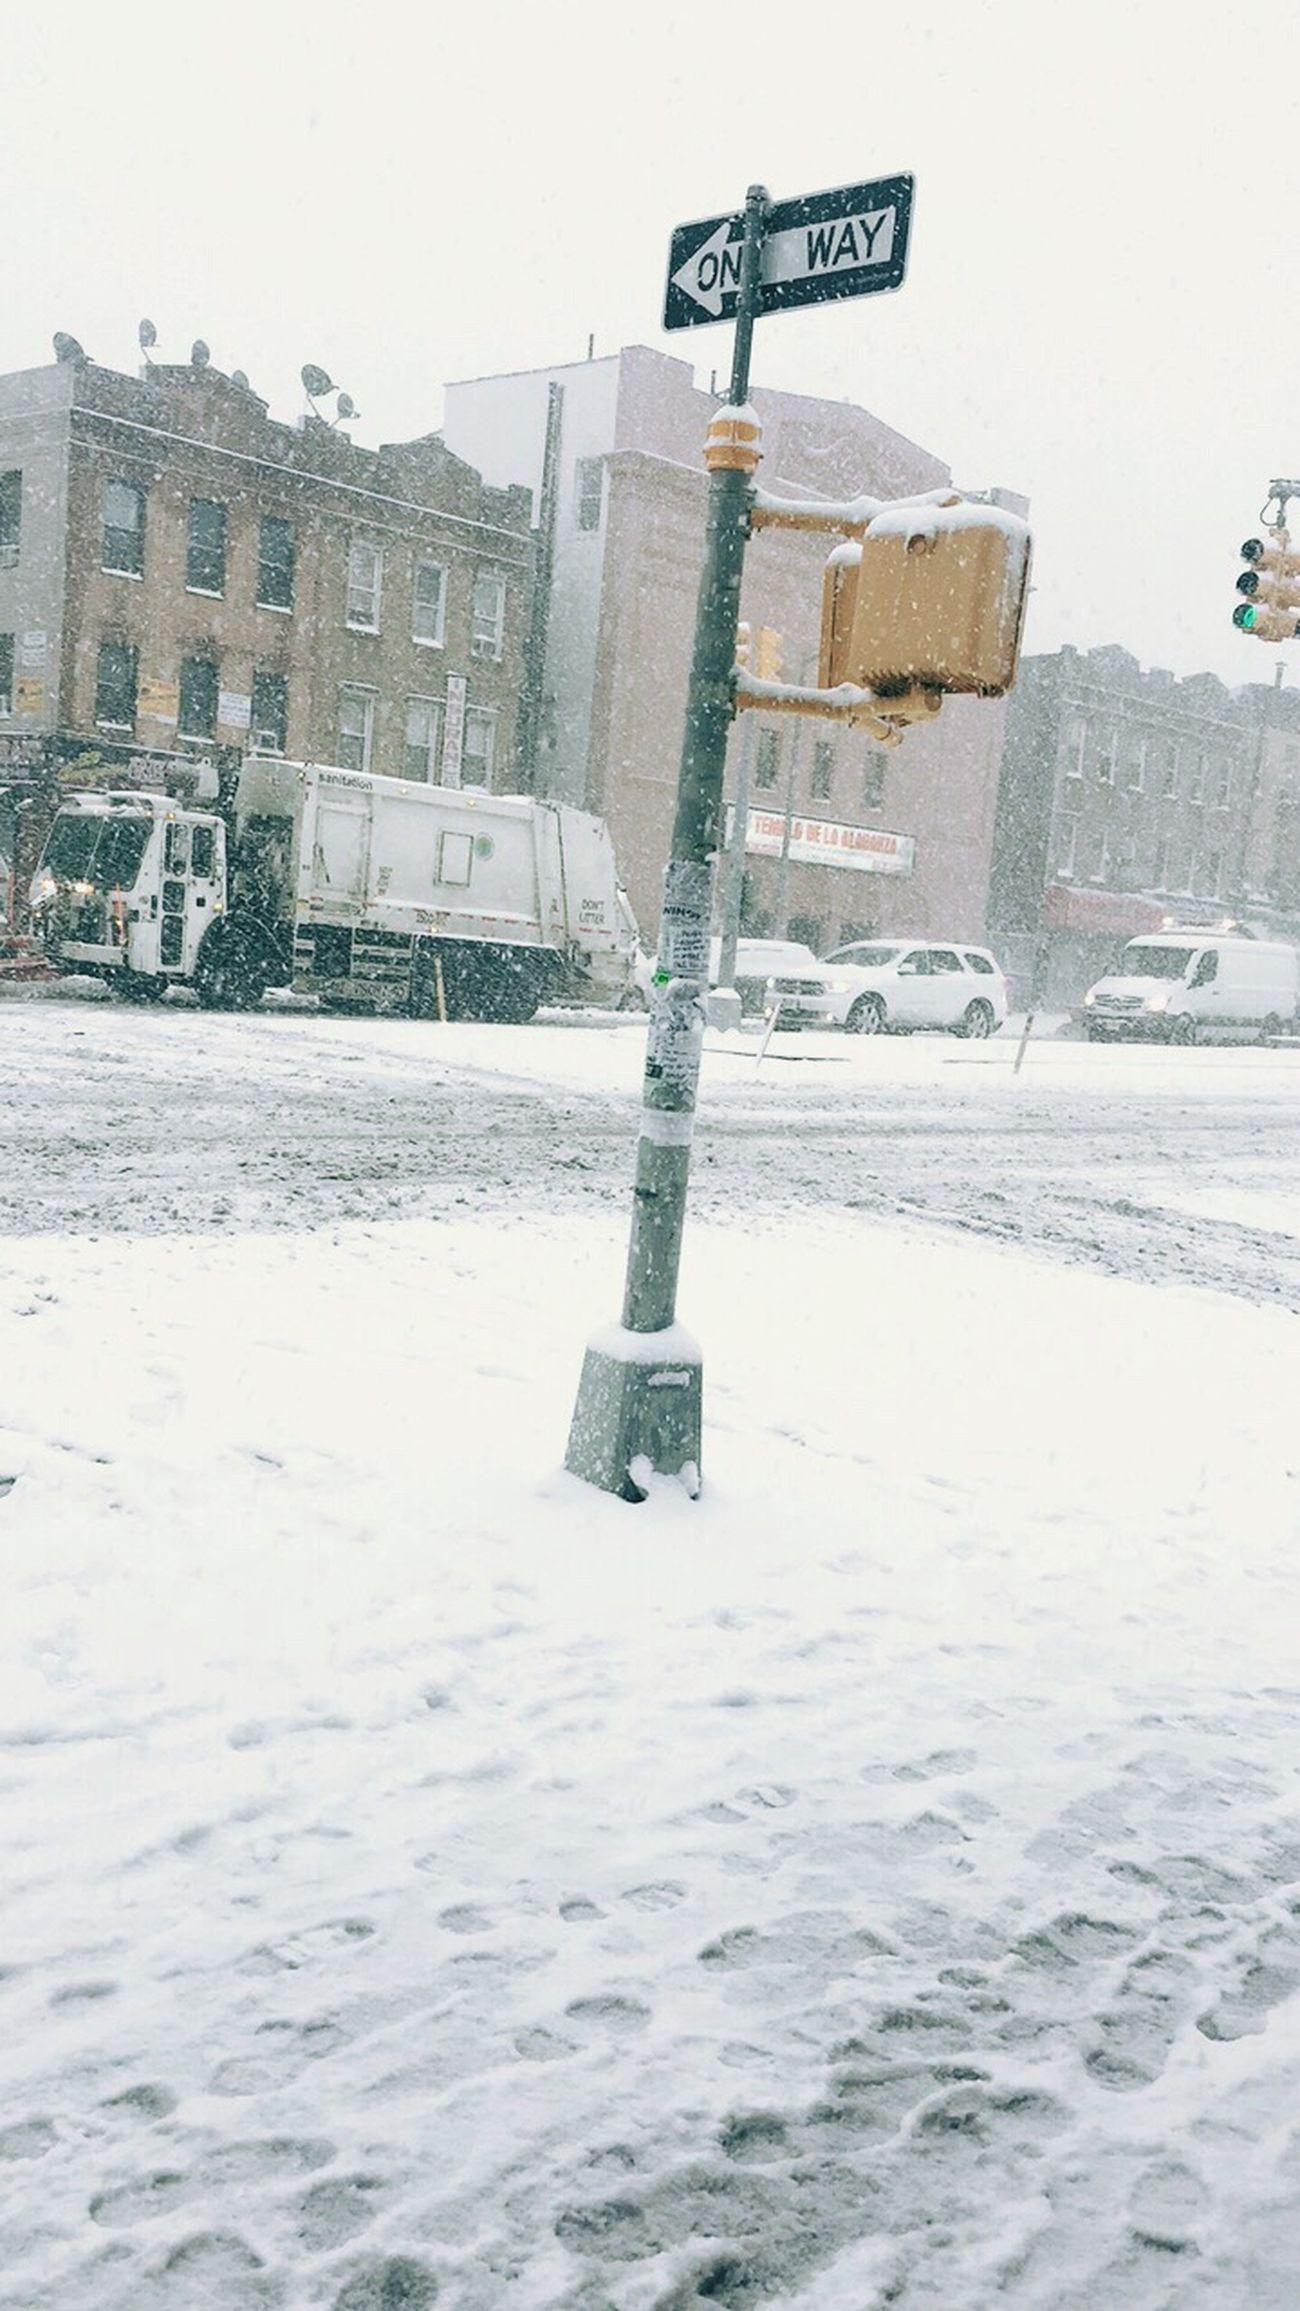 SnowDay 🌨